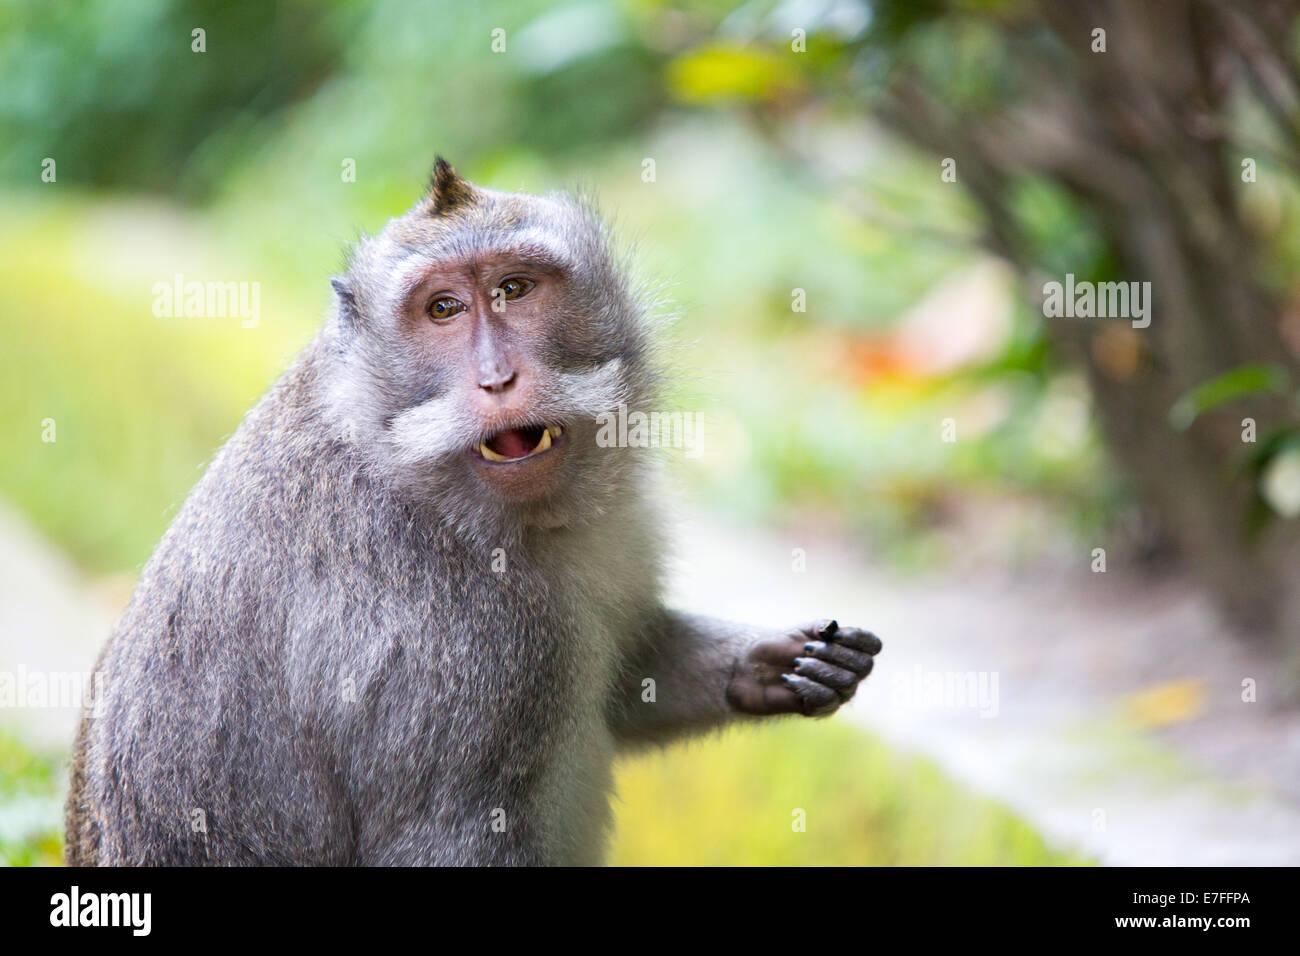 A monkey keeps an eye on its surroundings in Monkey Forest, Ubud, Bali, Indonesia. - Stock Image